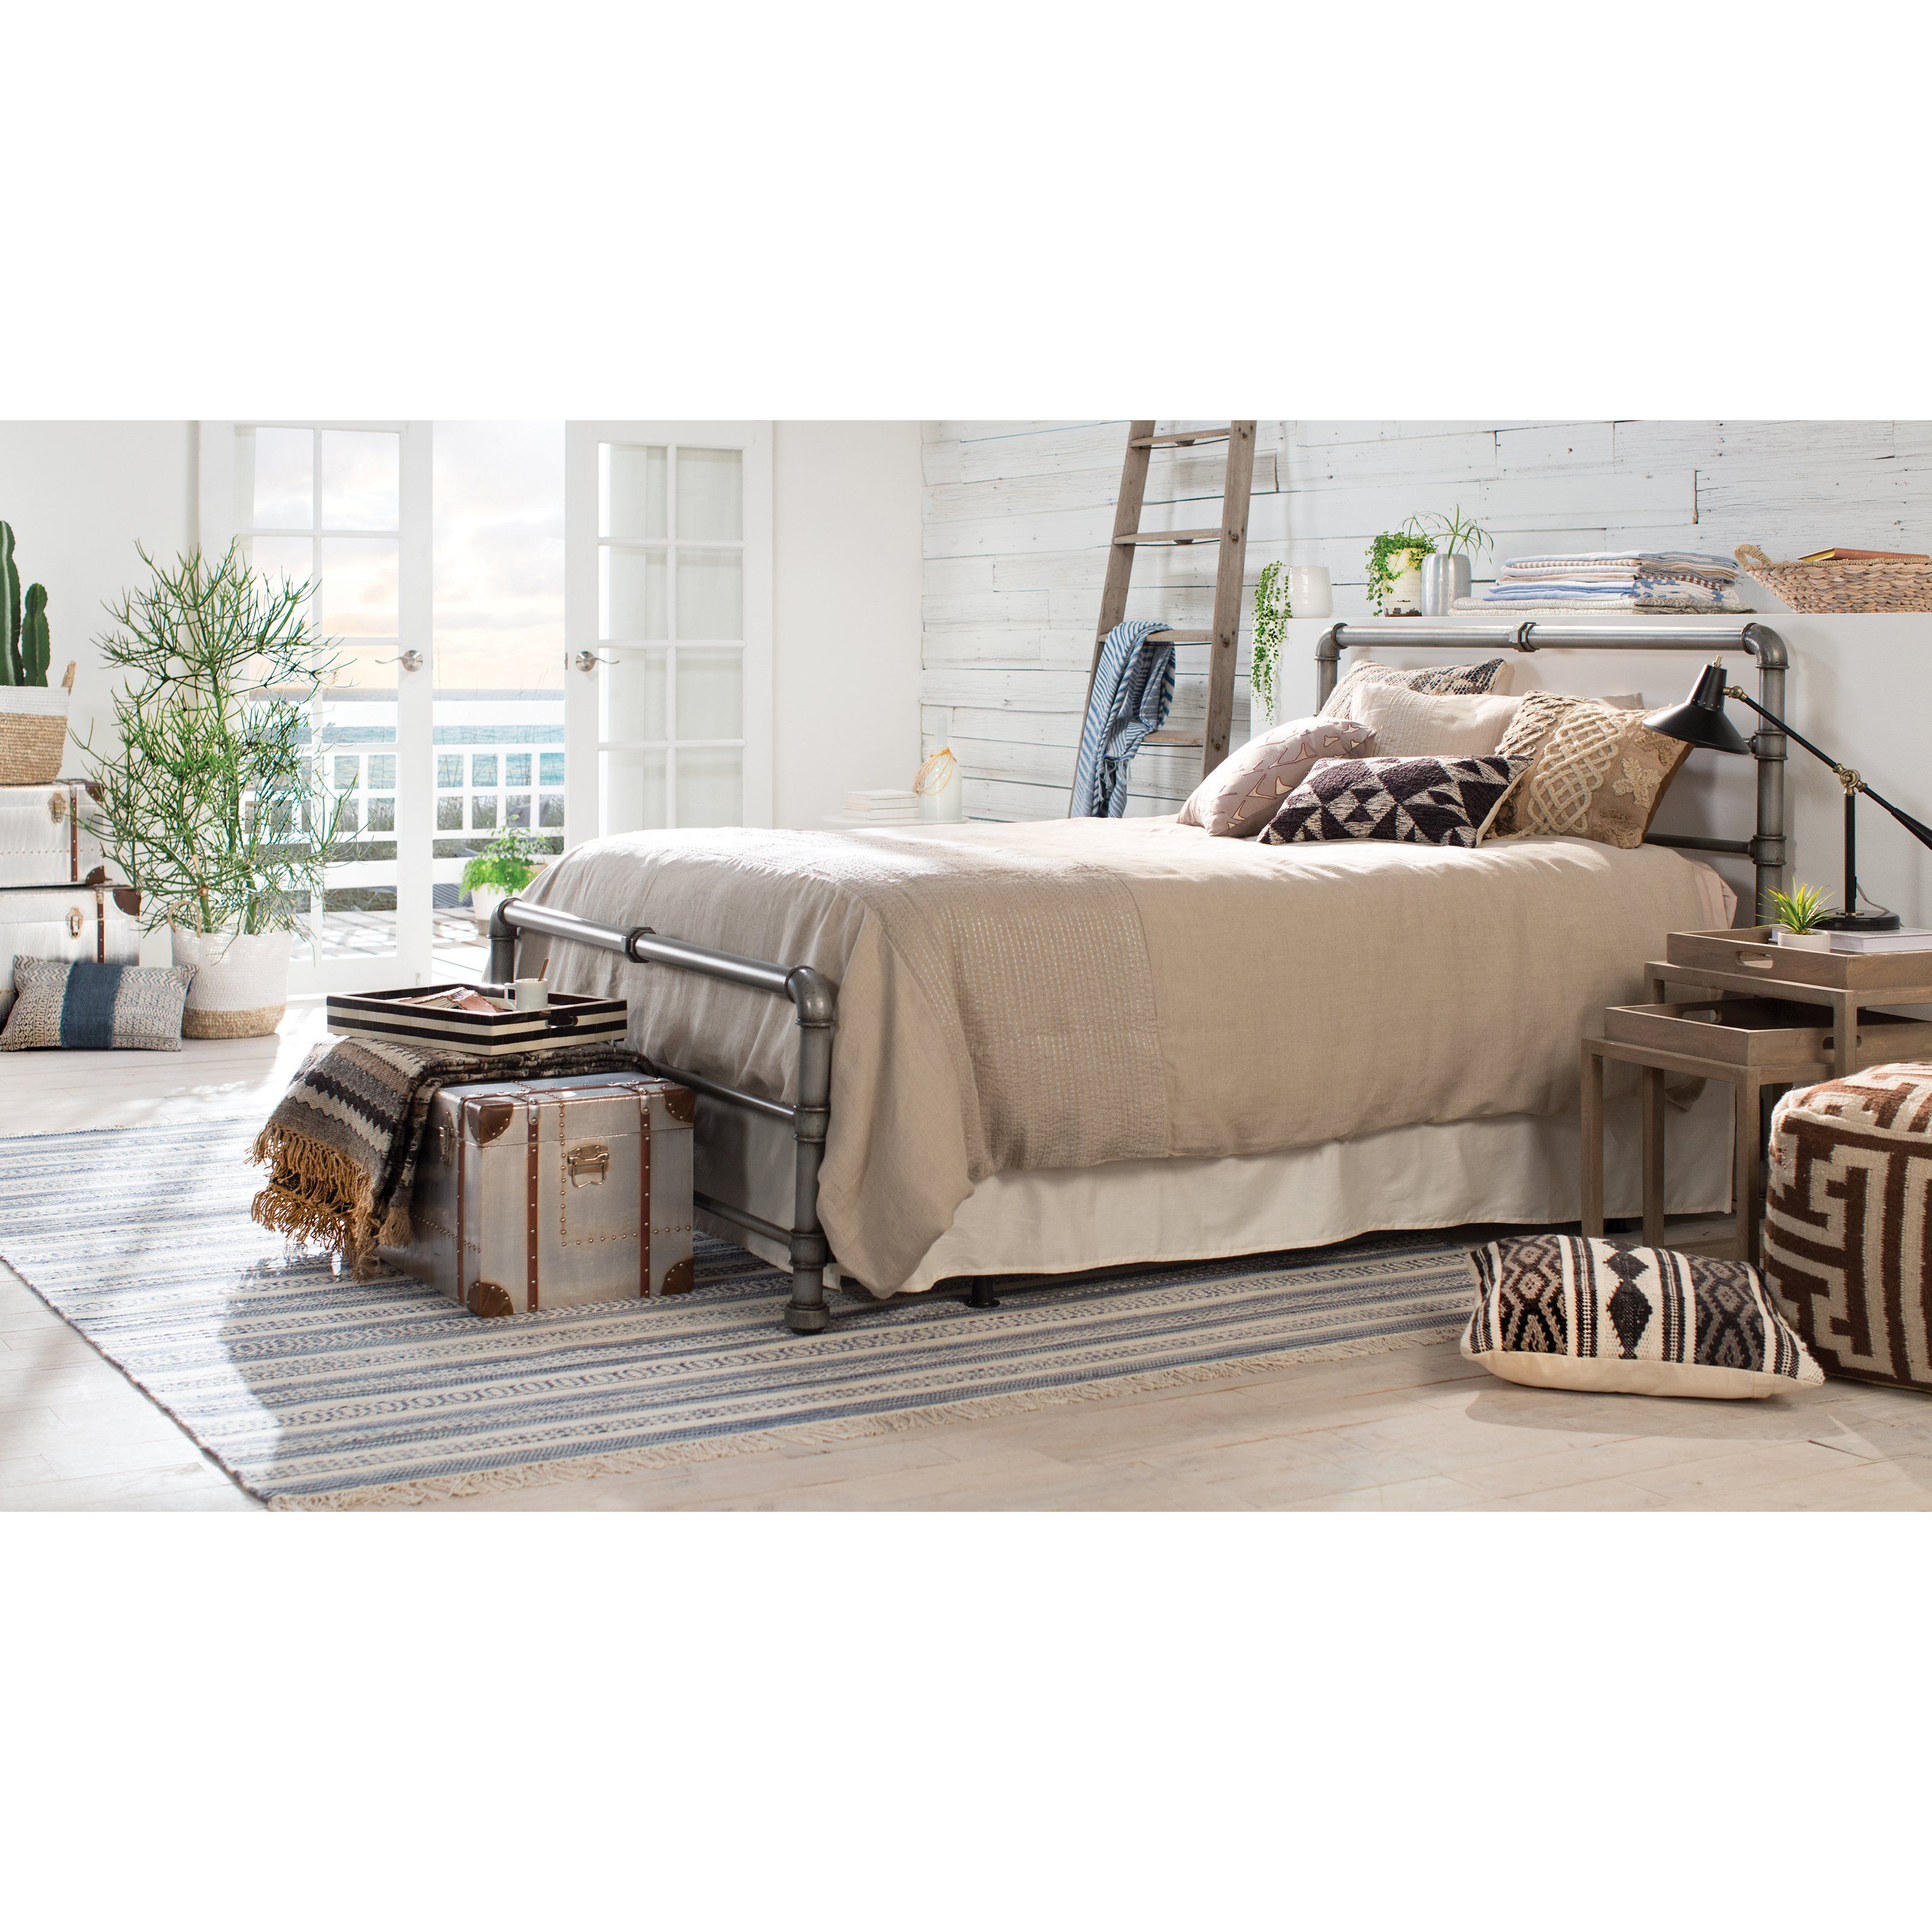 how to create an industrial chic bedroom  hayneedle